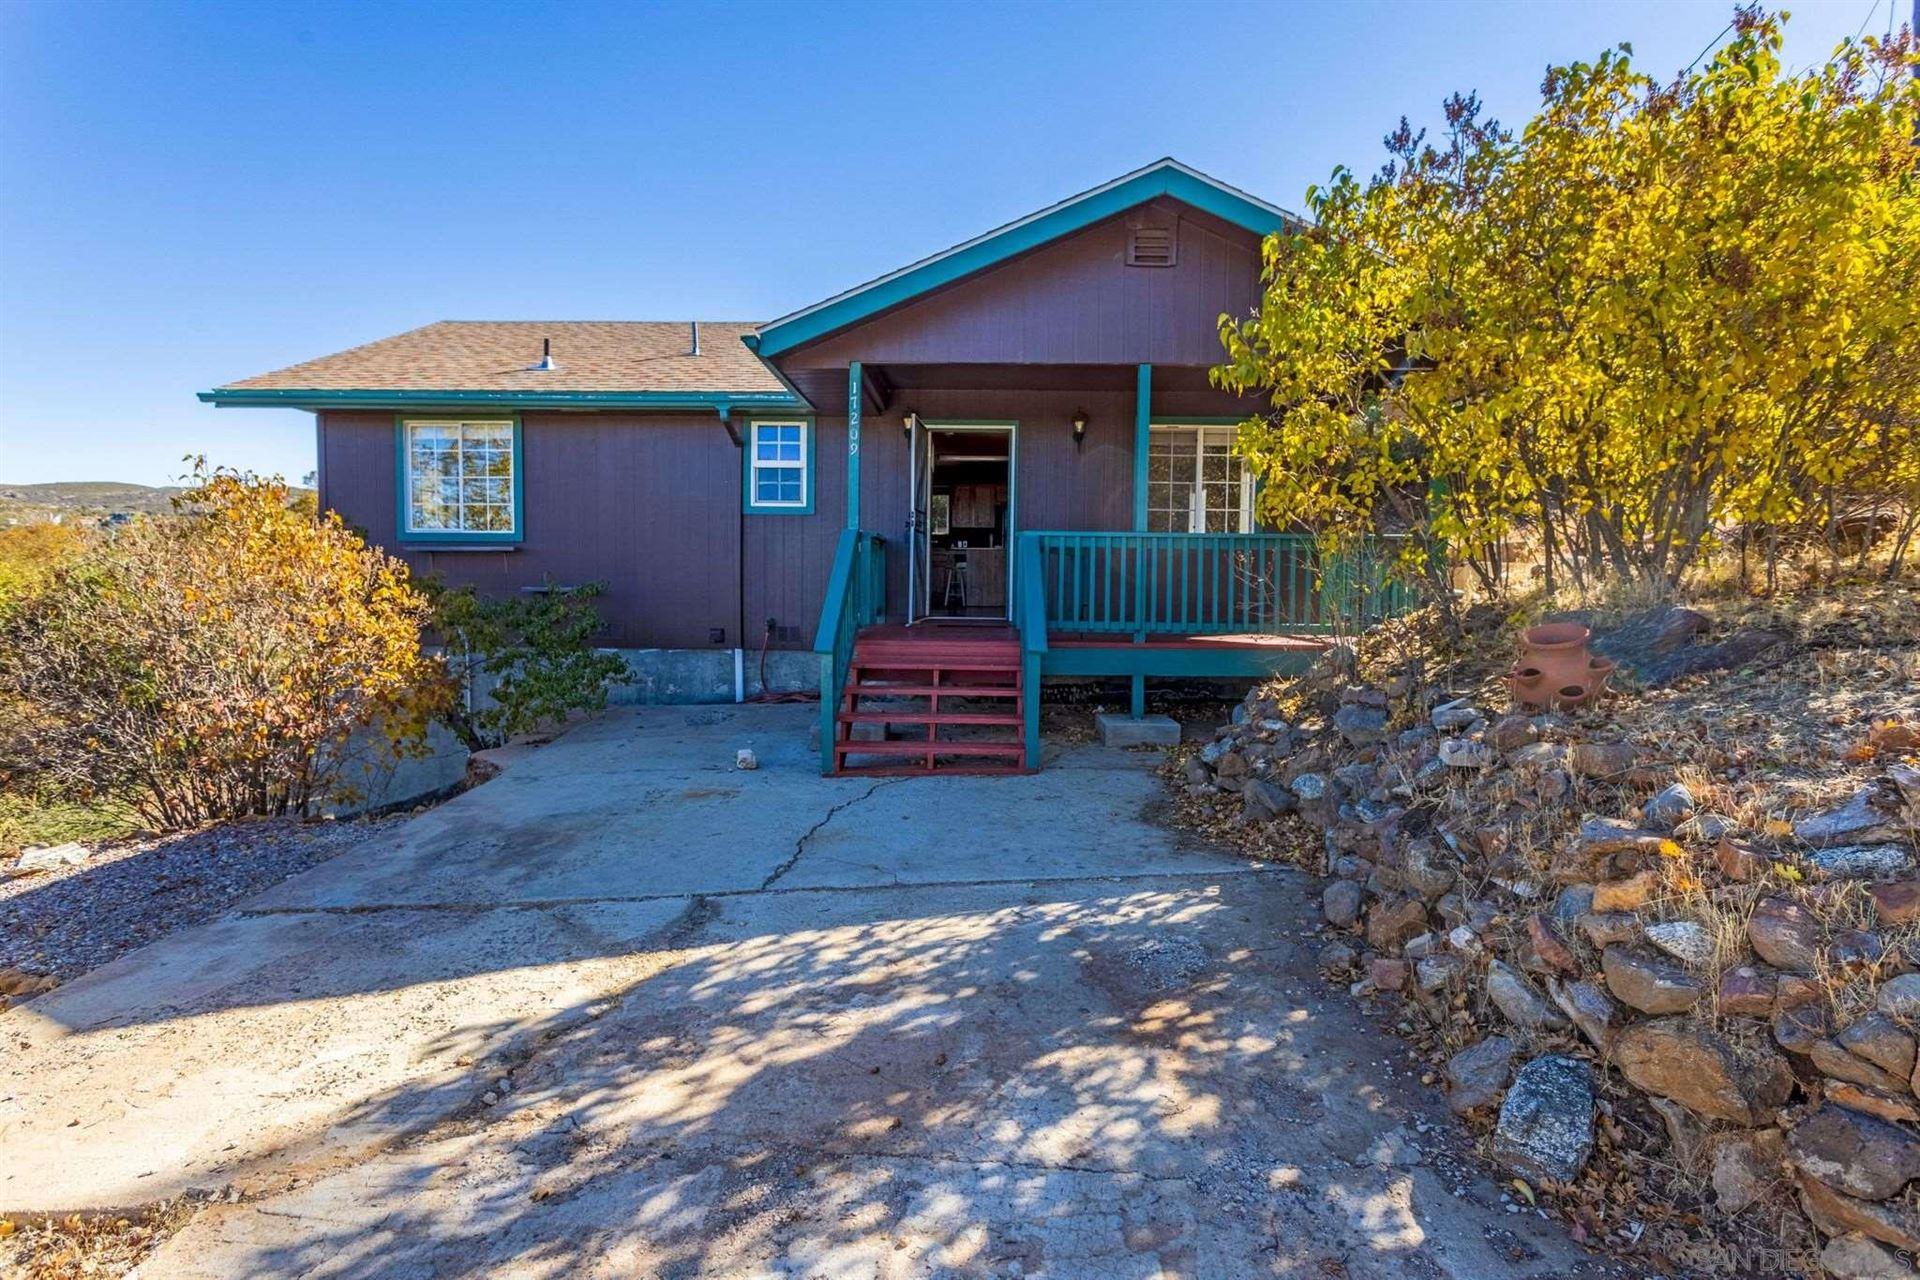 Photo of 17209 Iron Springs Rd, Julian, CA 92036 (MLS # 200051796)